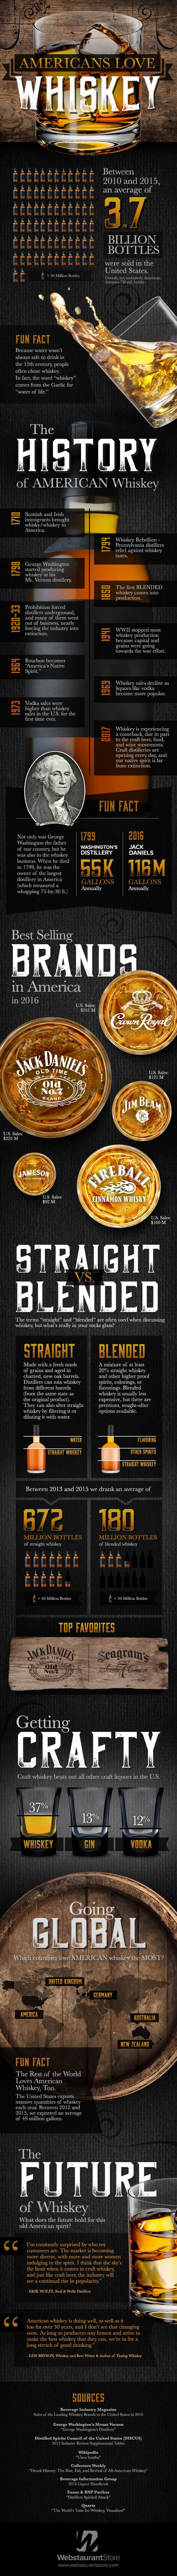 infographic america s bourbon boom